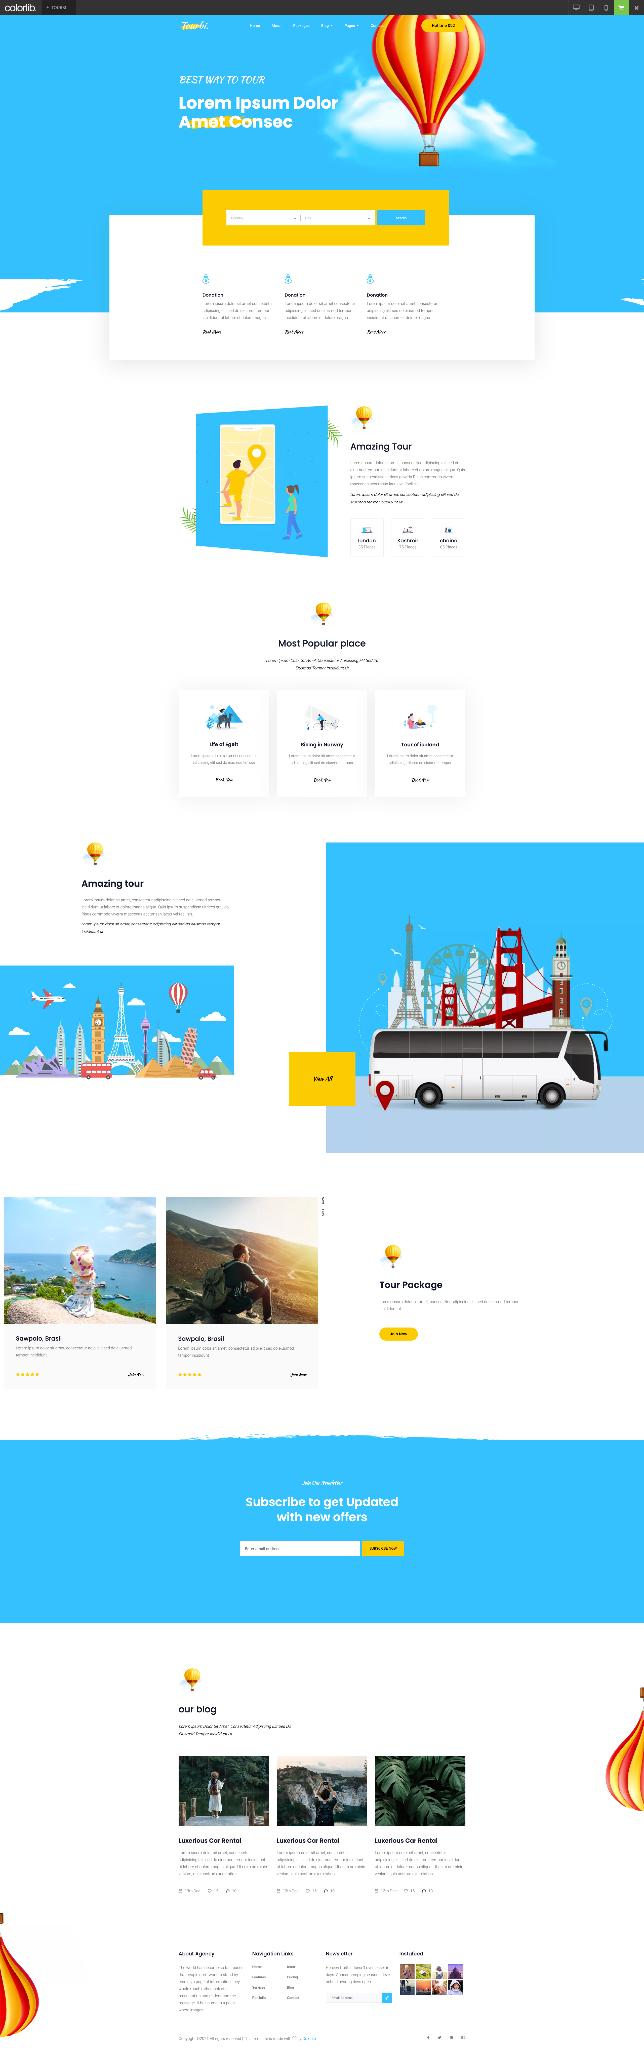 Mẫu website du lịch 5